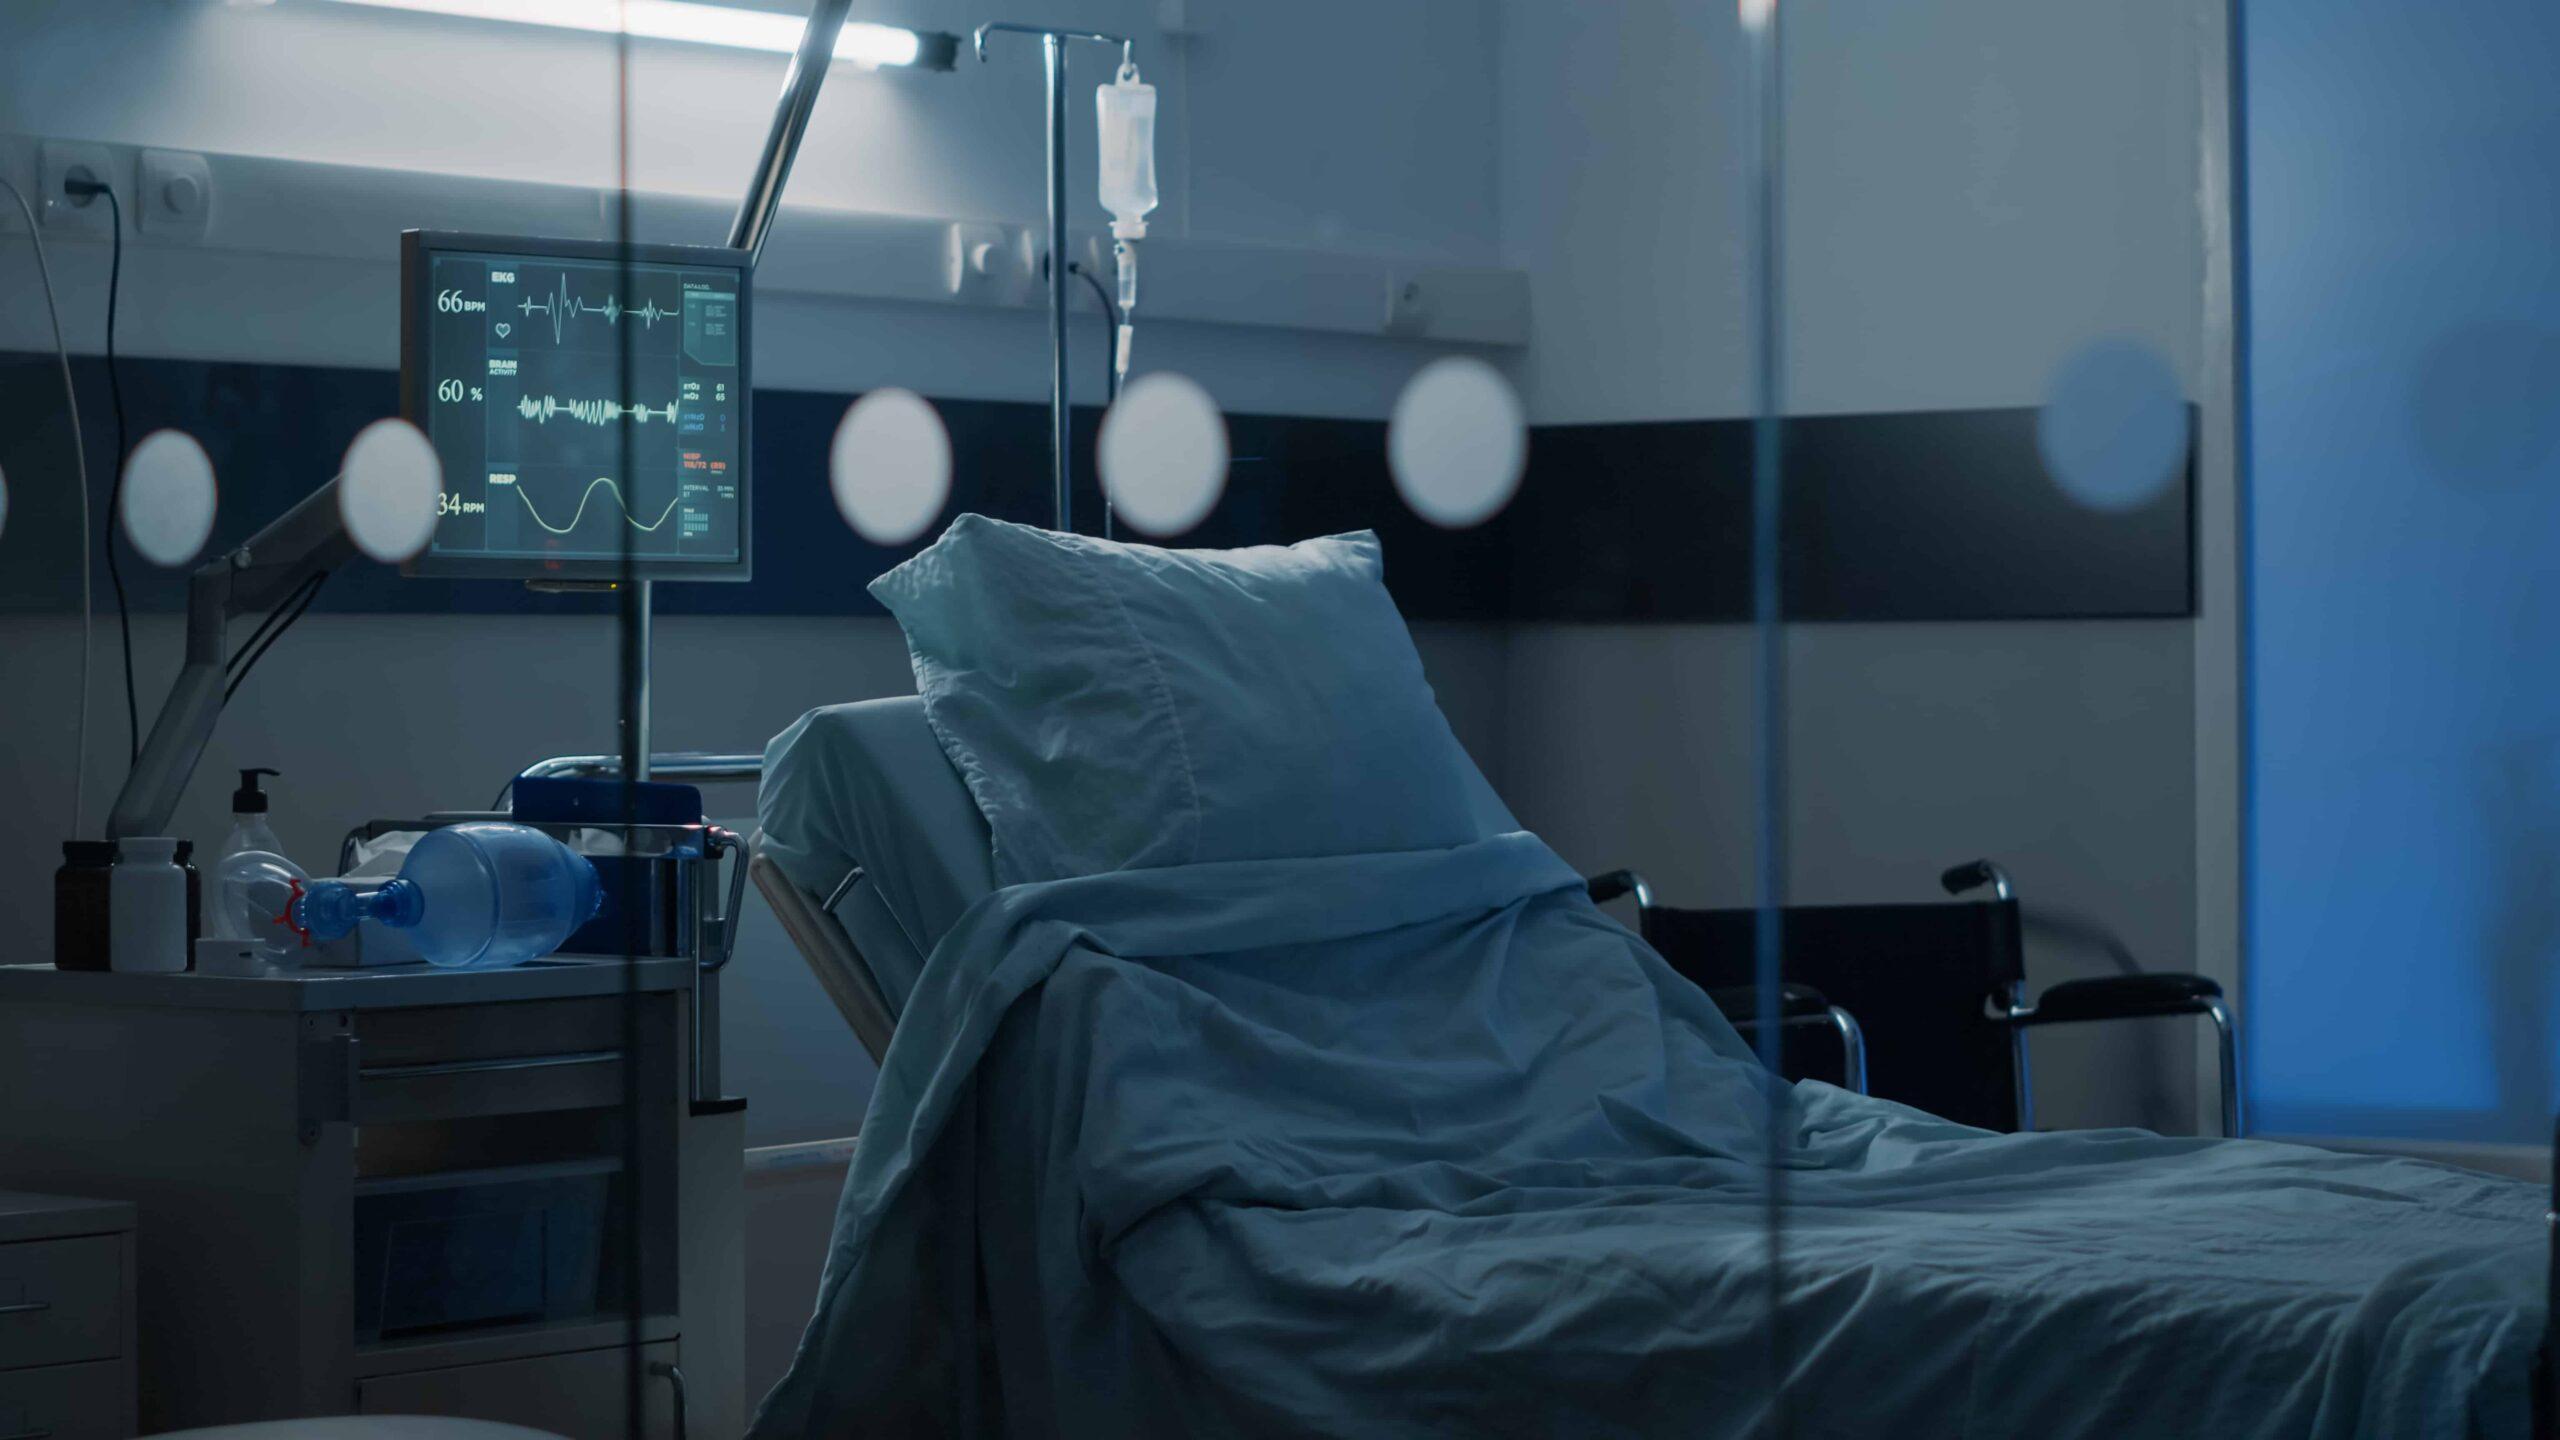 Beyond summer pressures: Maximising patient flow through dedicated care coordination